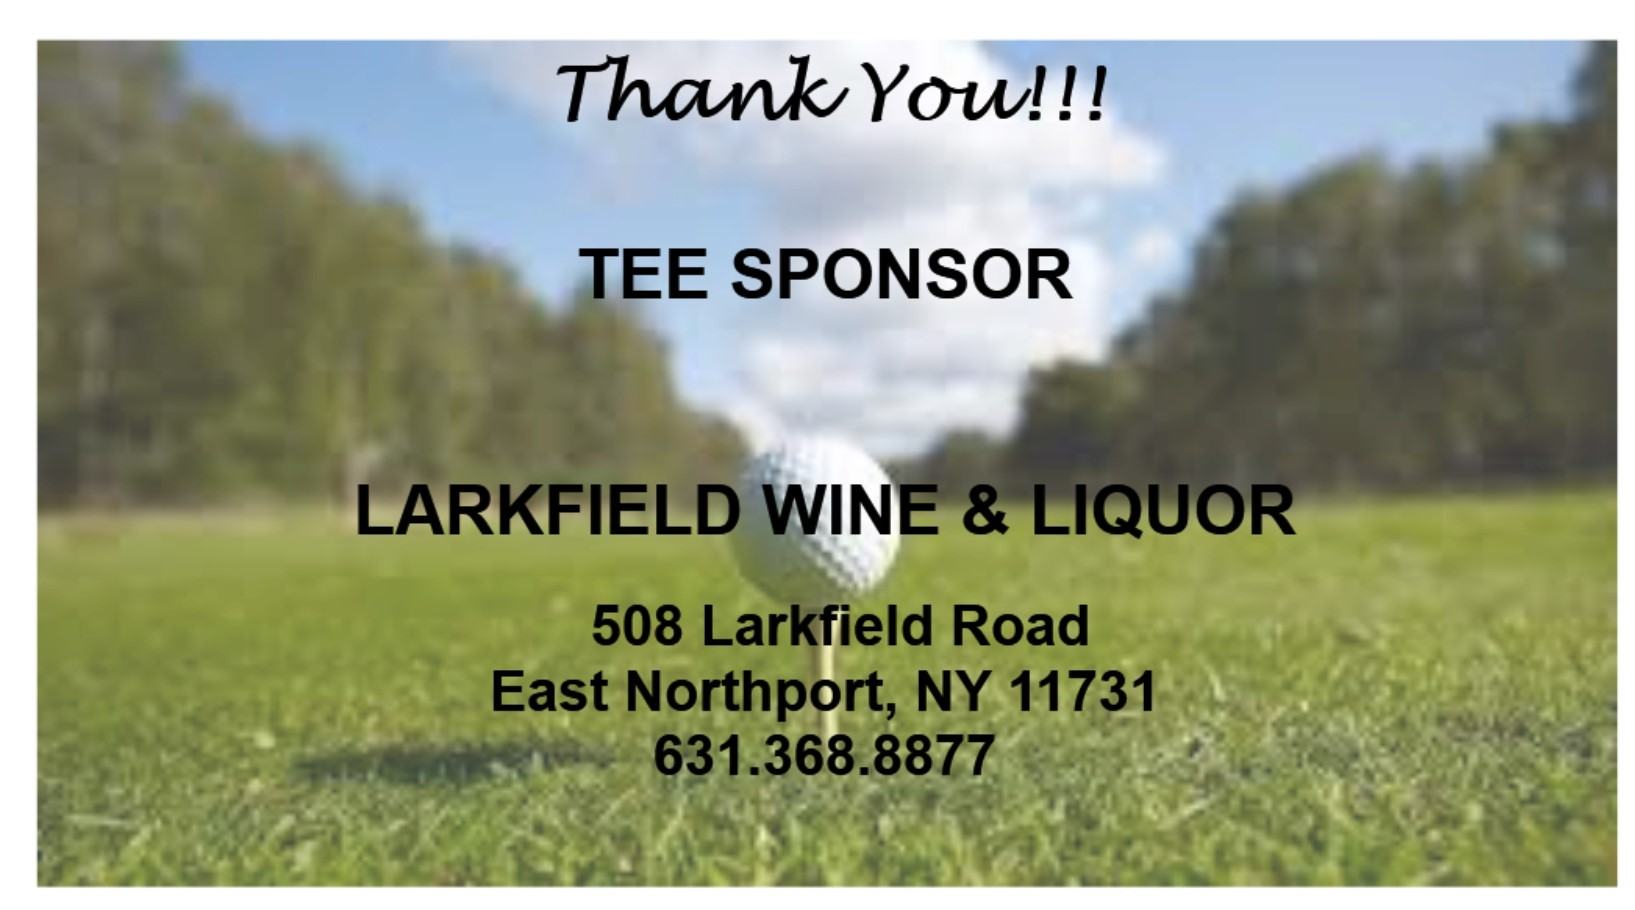 Larkfield Wine & Liquor